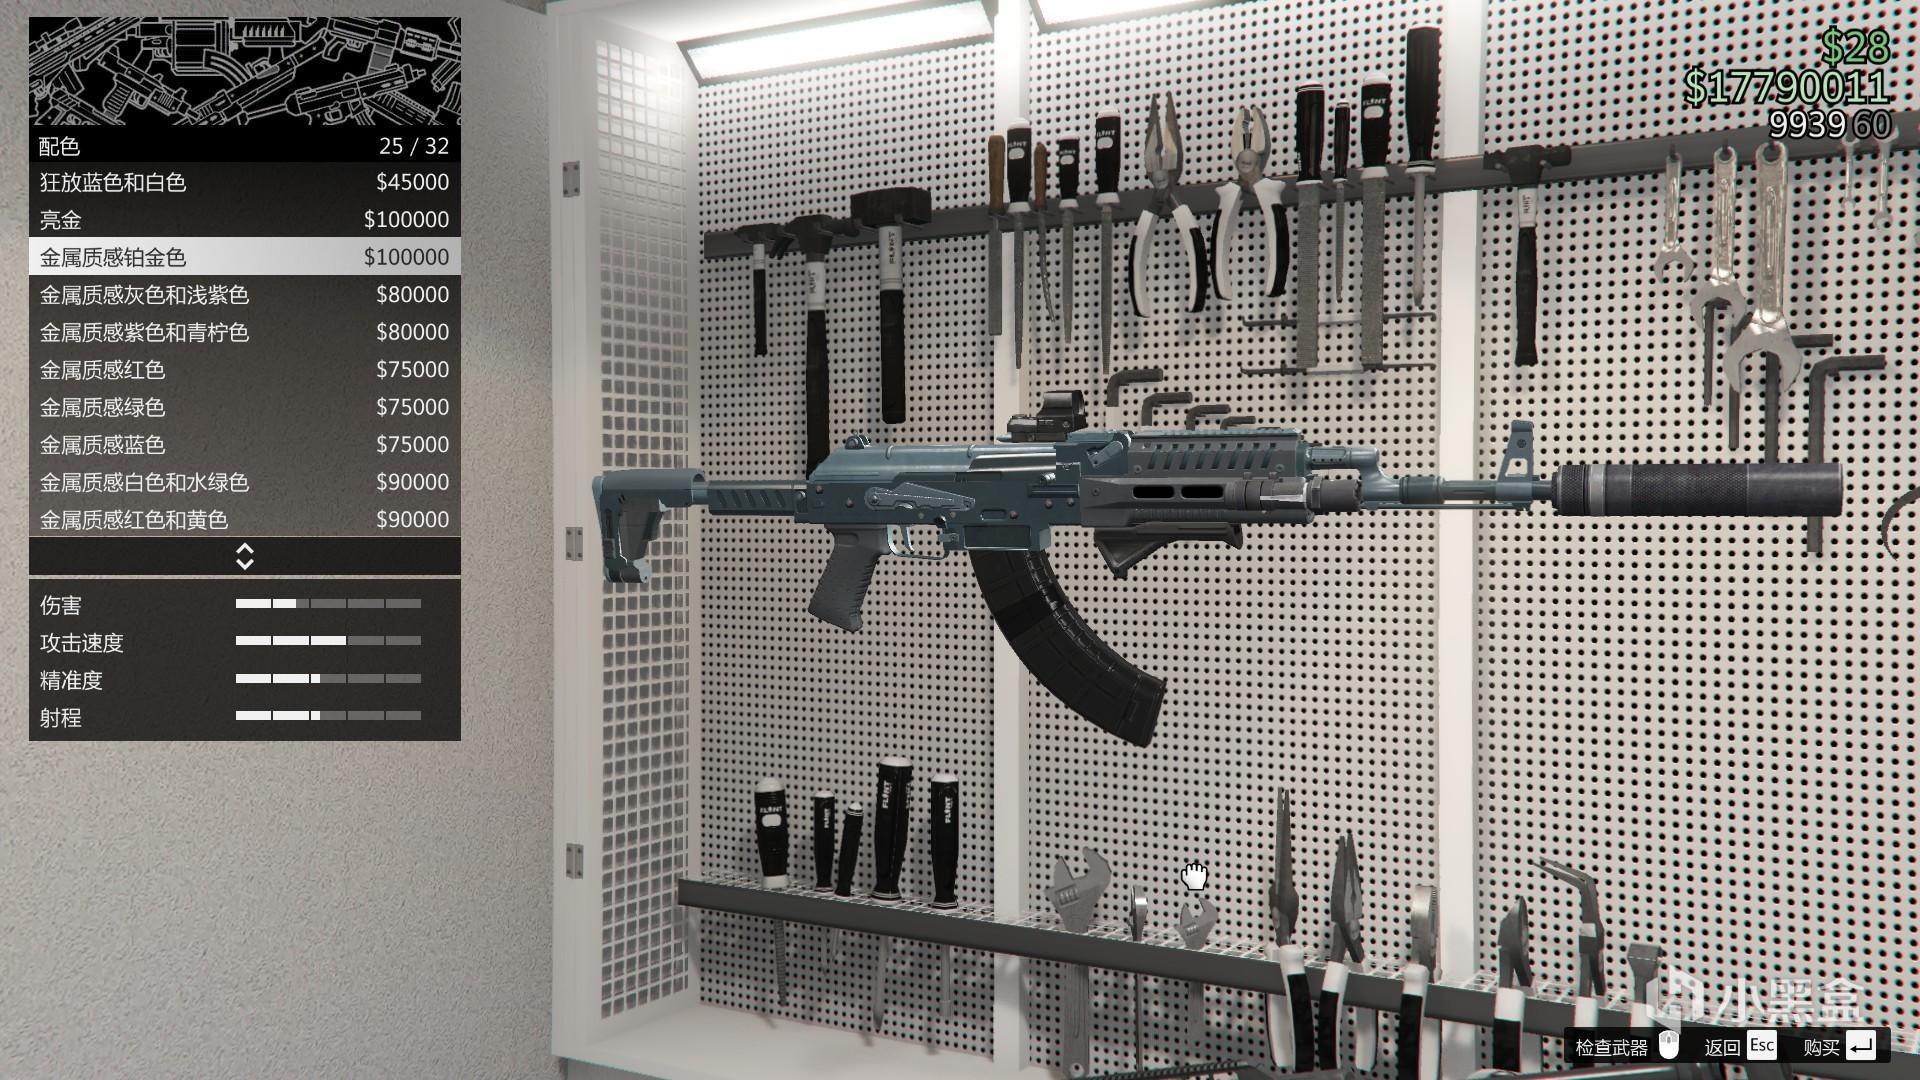 GTA5 线上模式各阶段武器推荐(中期)插图15